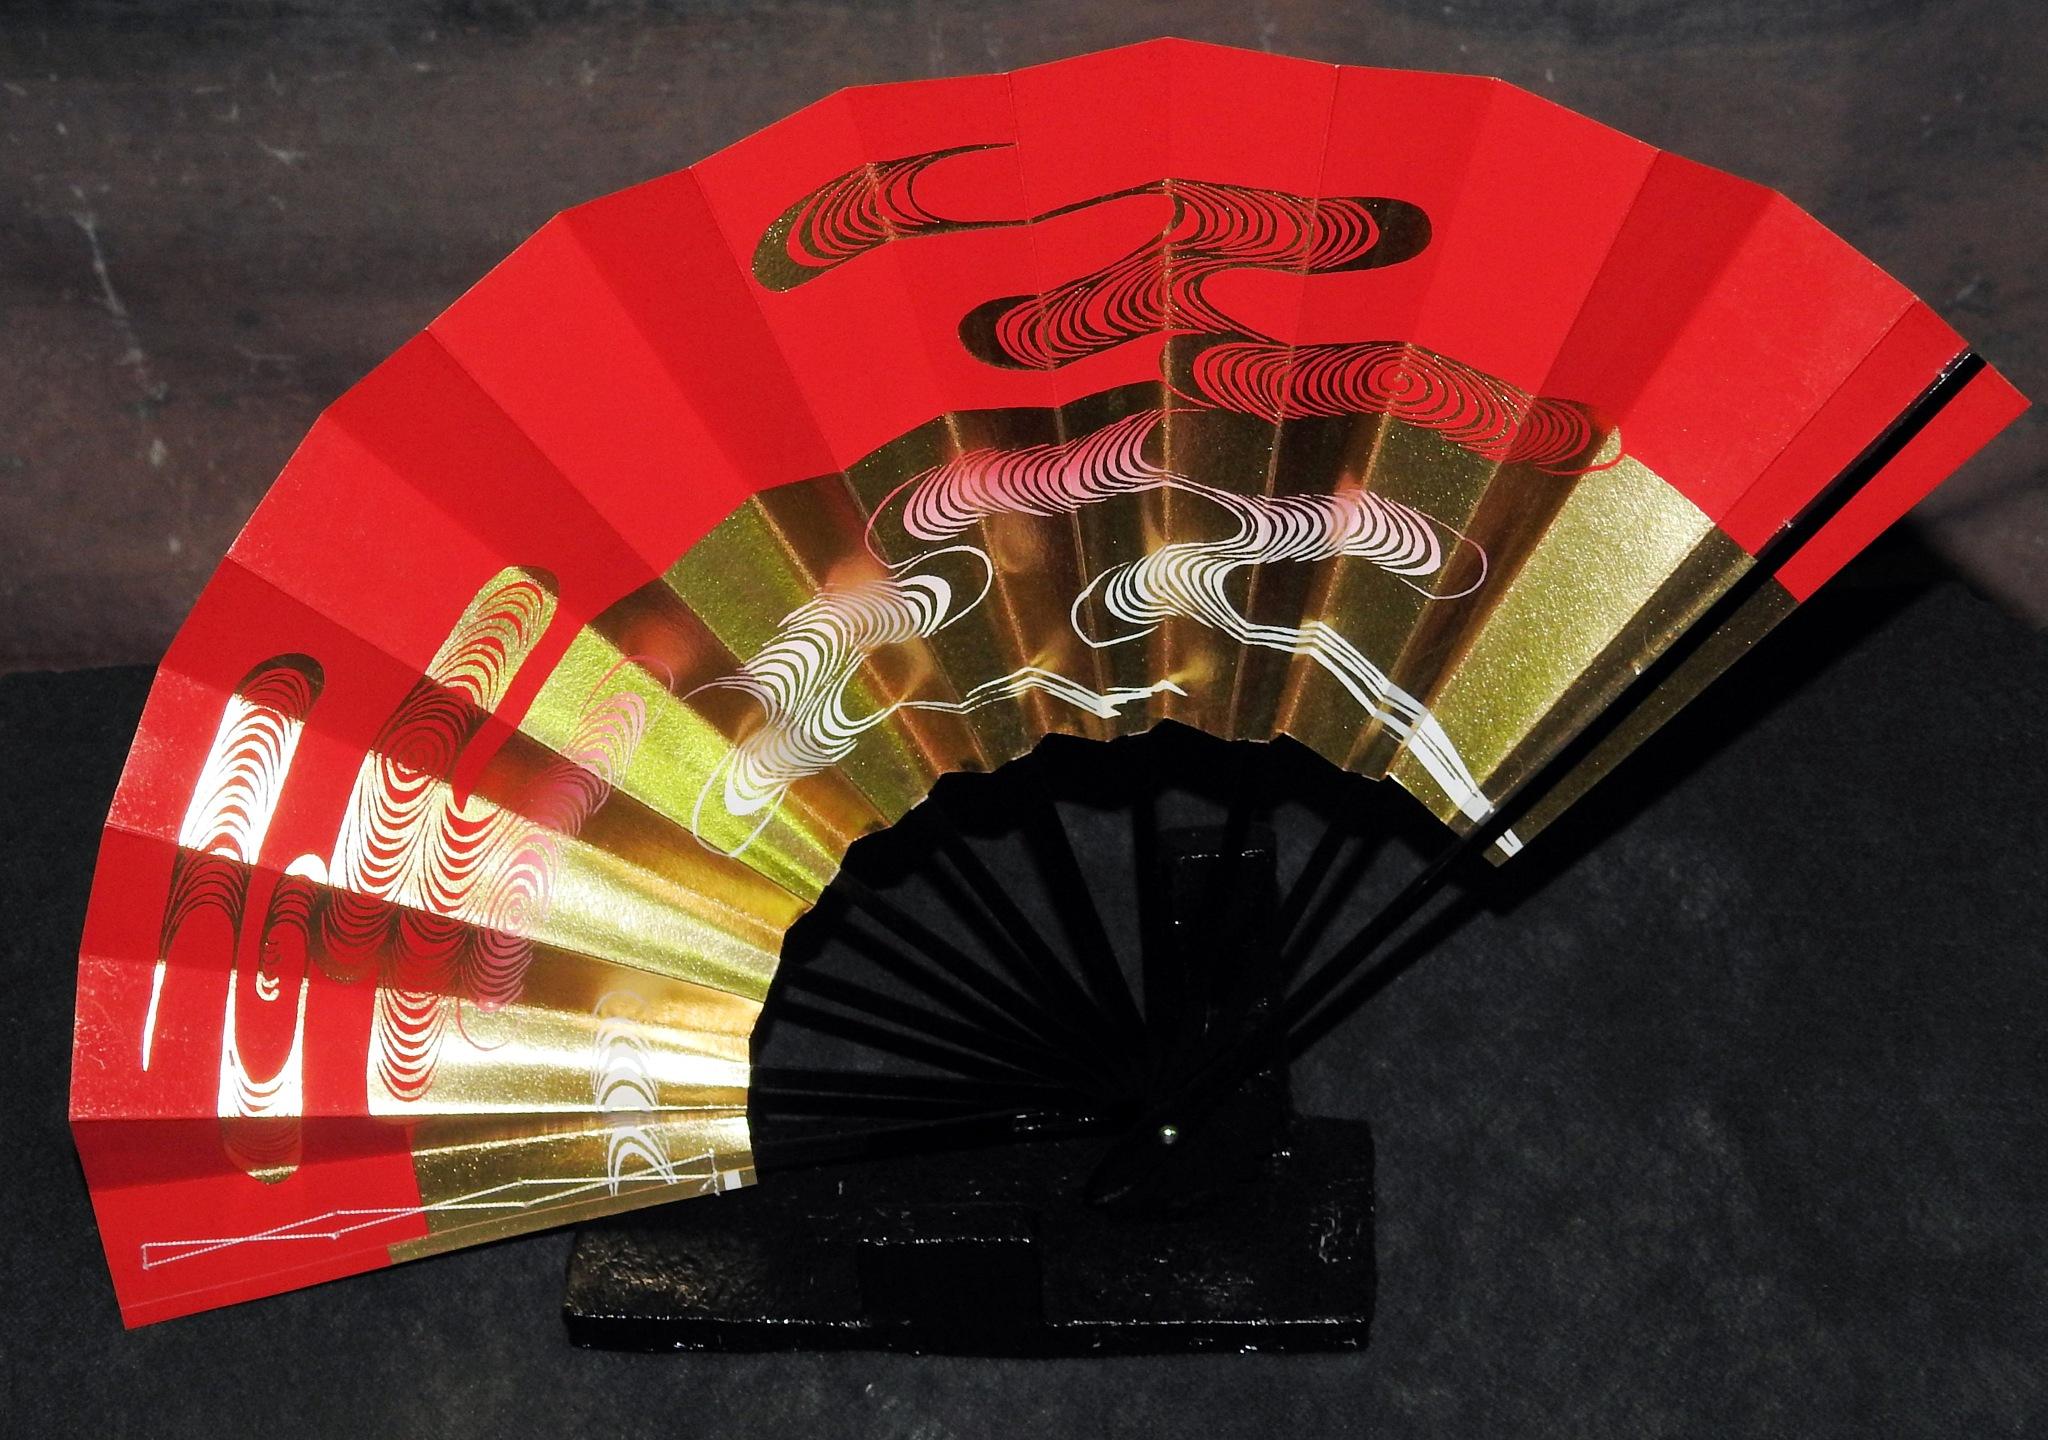 Naples  Meets The World - The Japan's Fan - 1 by Arnaldo De Lisio